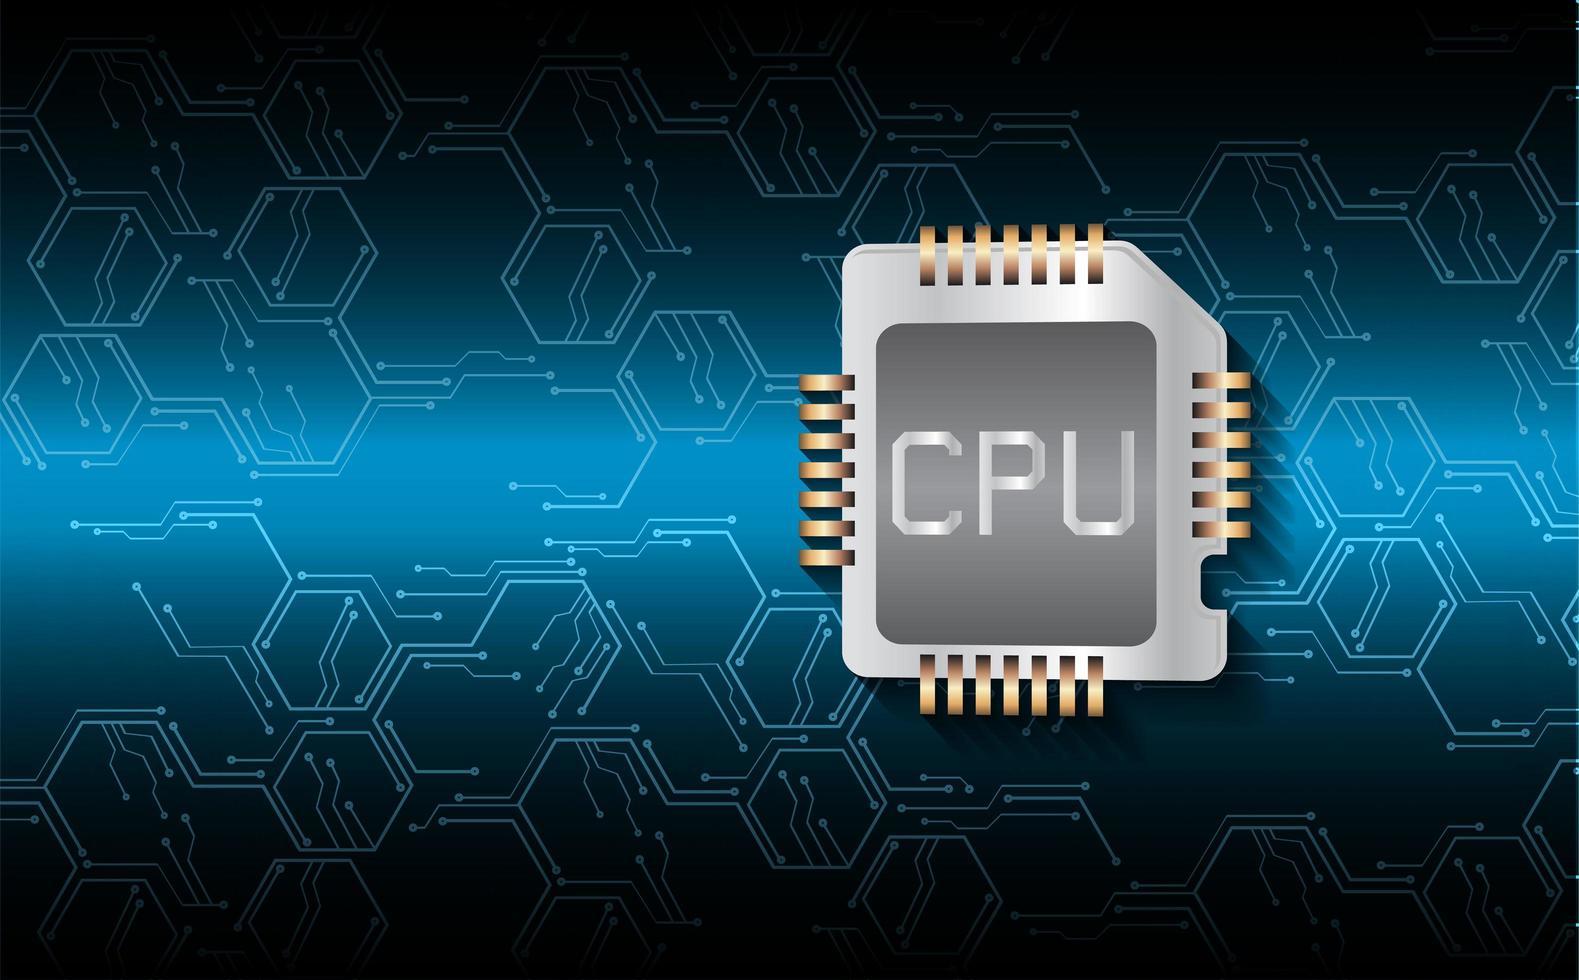 cpu cyber circuit toekomstige technologie concept achtergrond vector